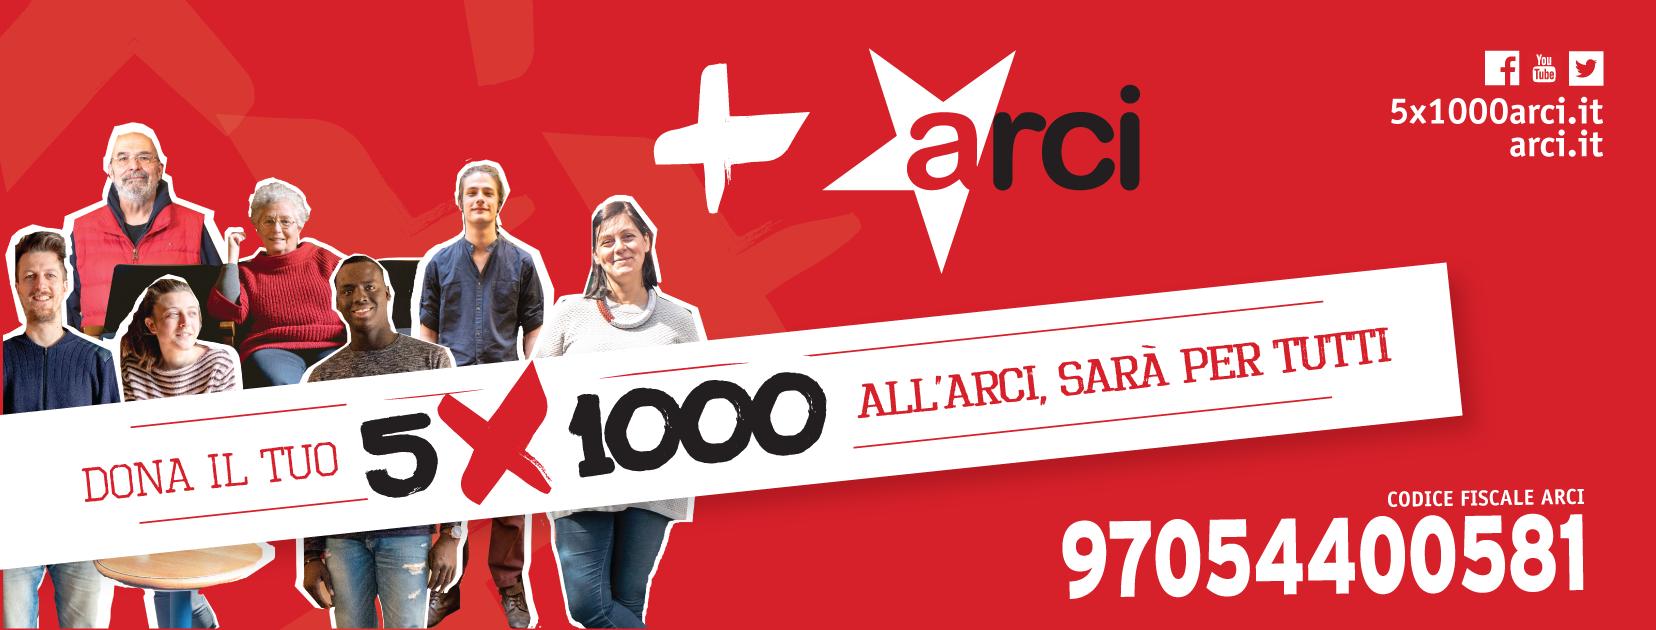 Arci 5×1000 2018